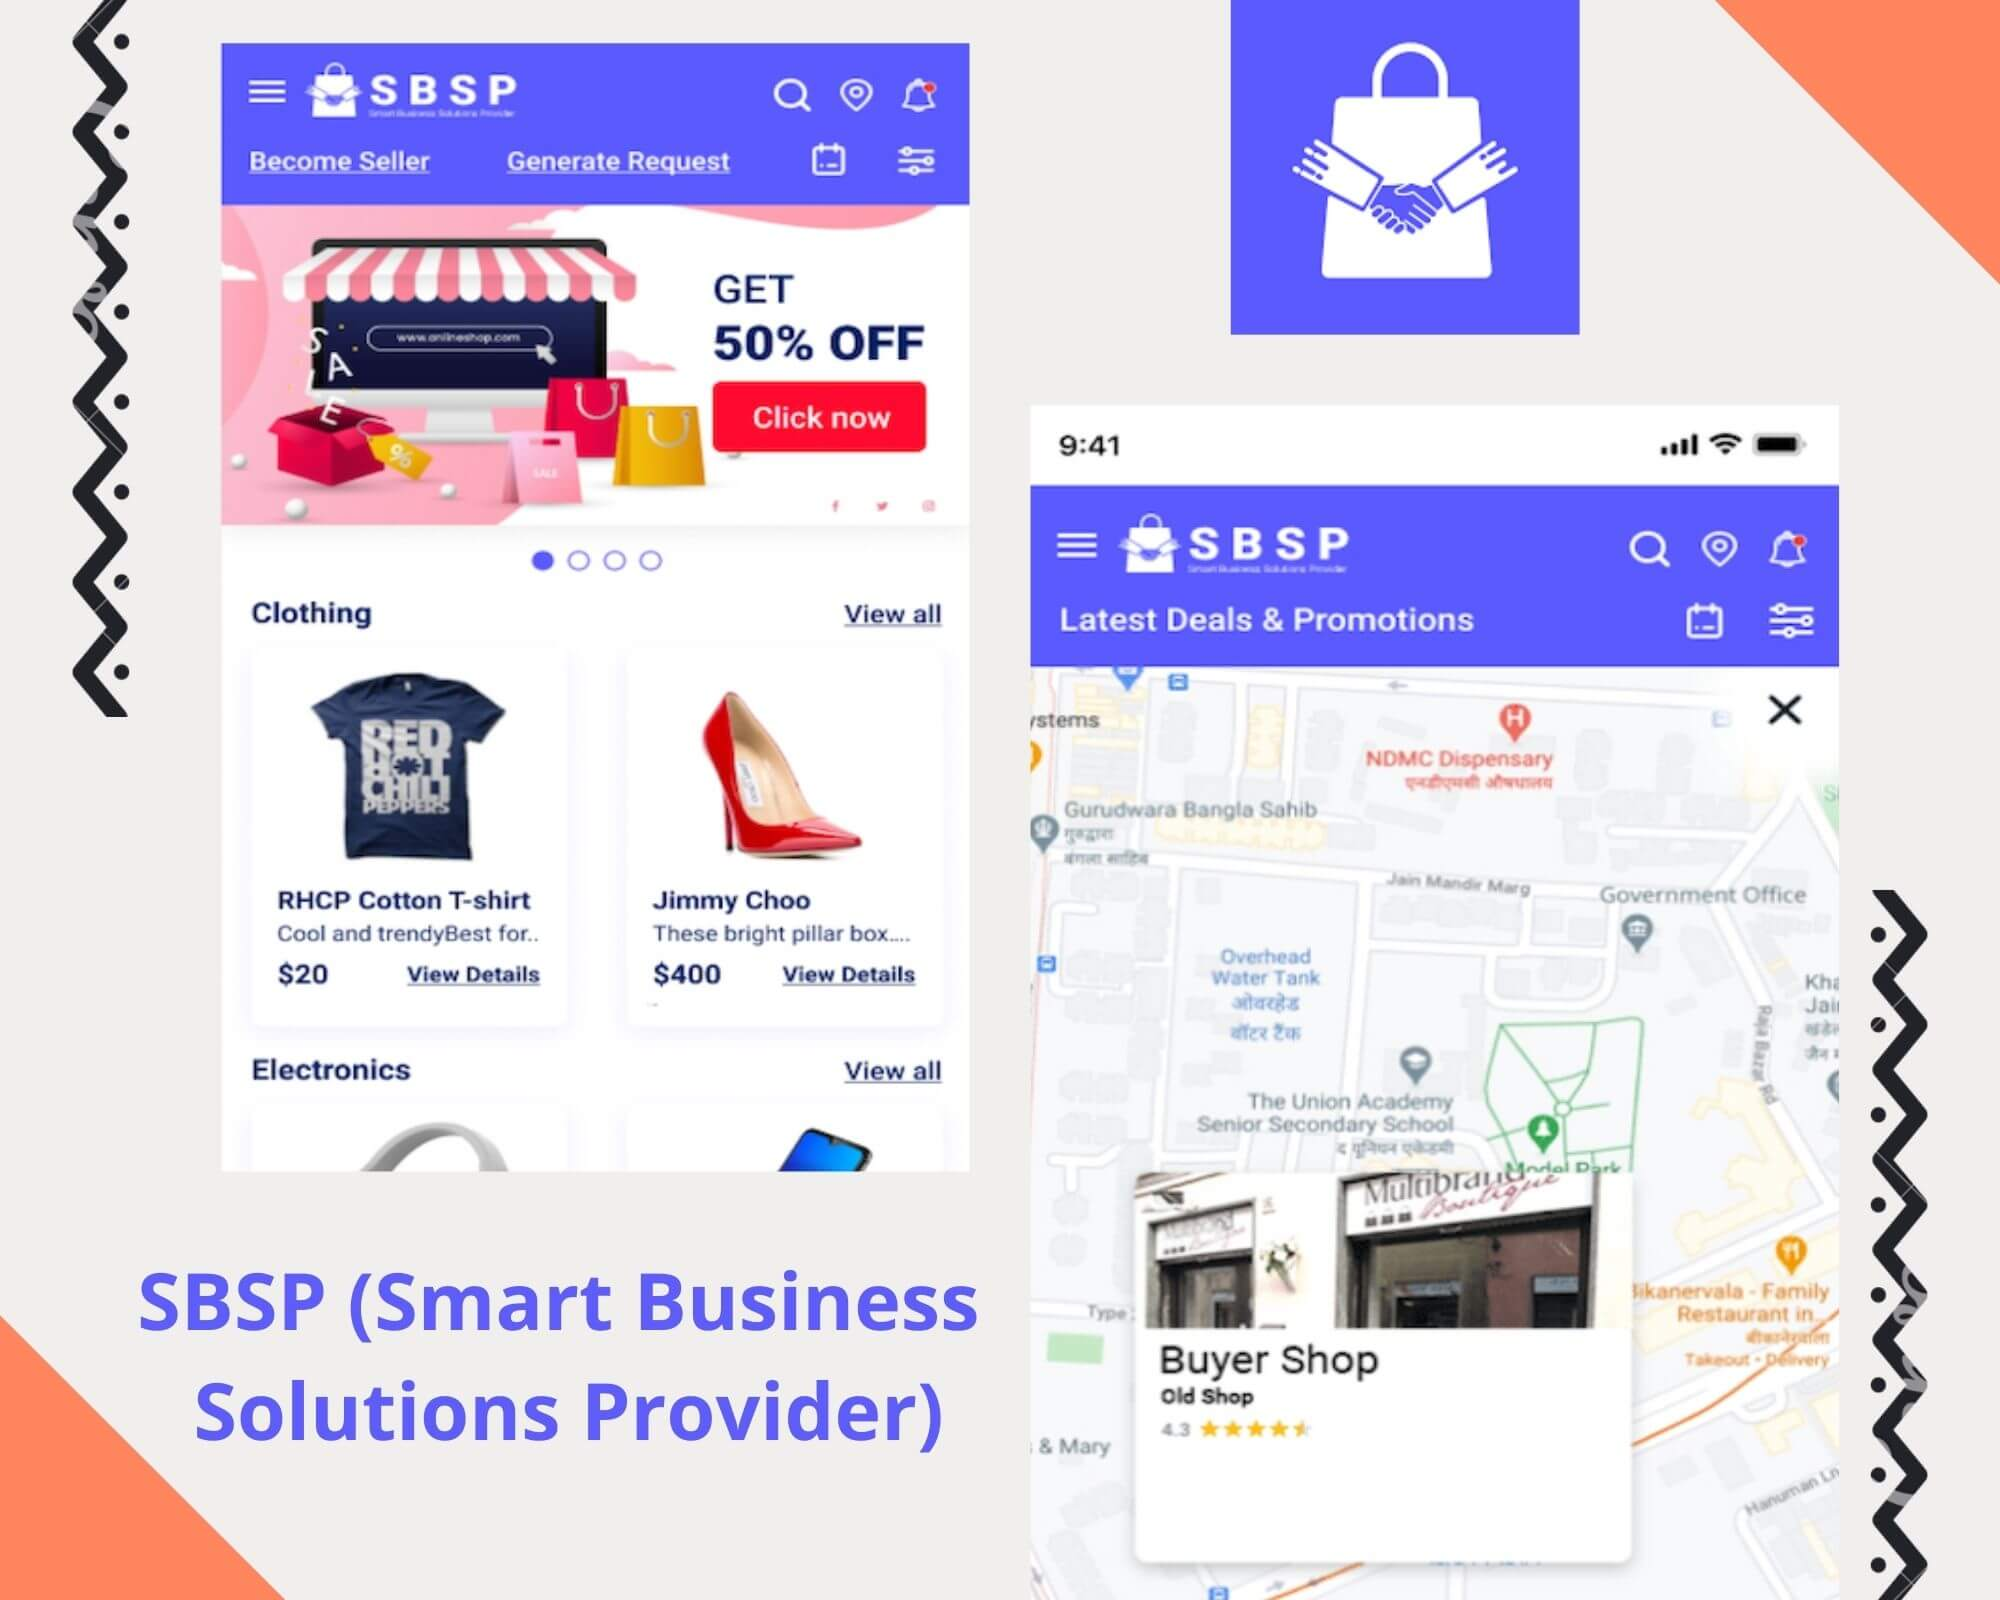 SBSP (Smart Business Solutions Provider)